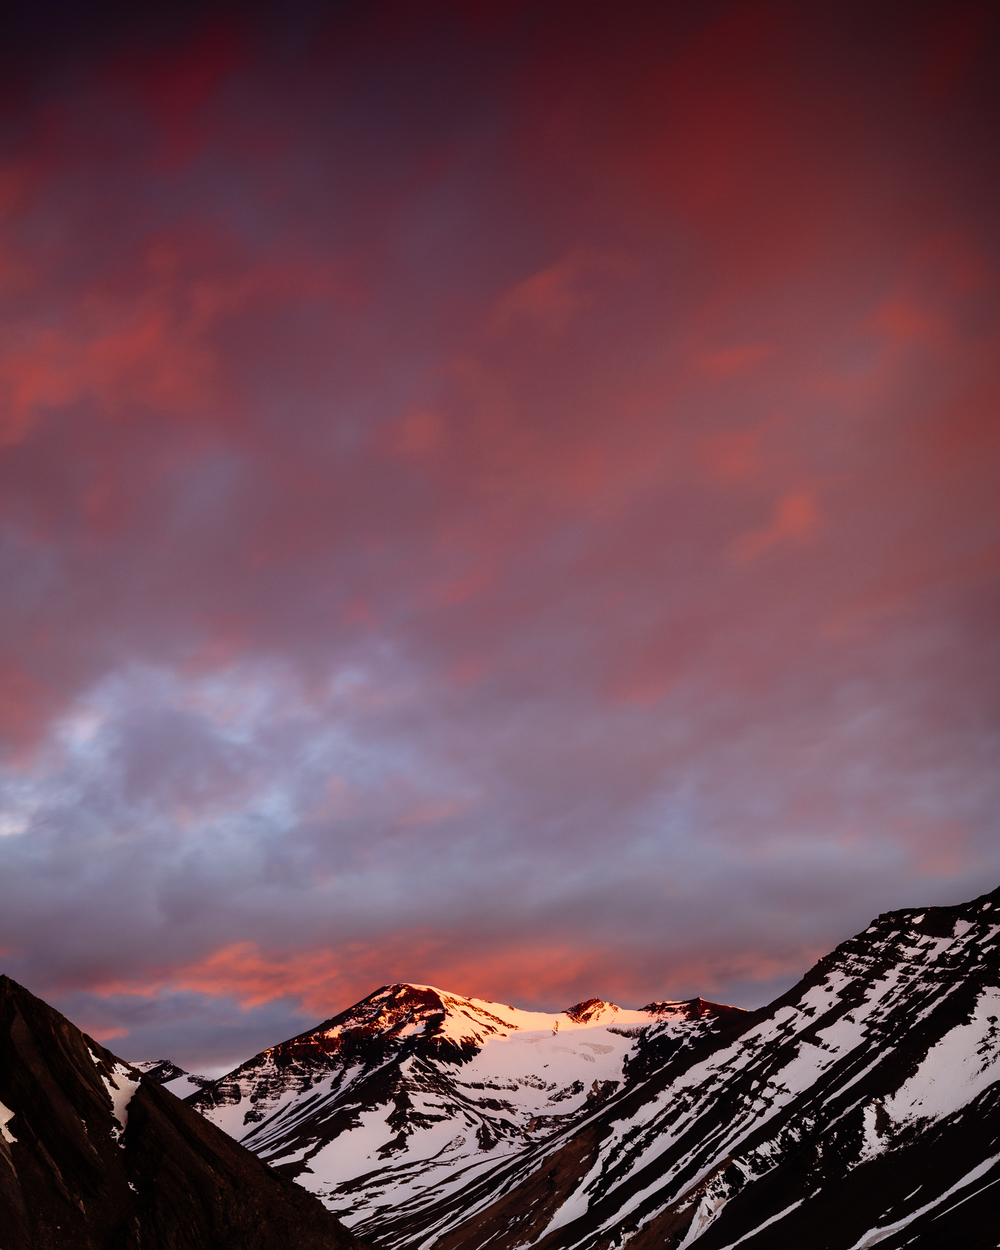 Torres Del Paine National Park, Patagonia, Magallanes y Antartica Chilena, Chile